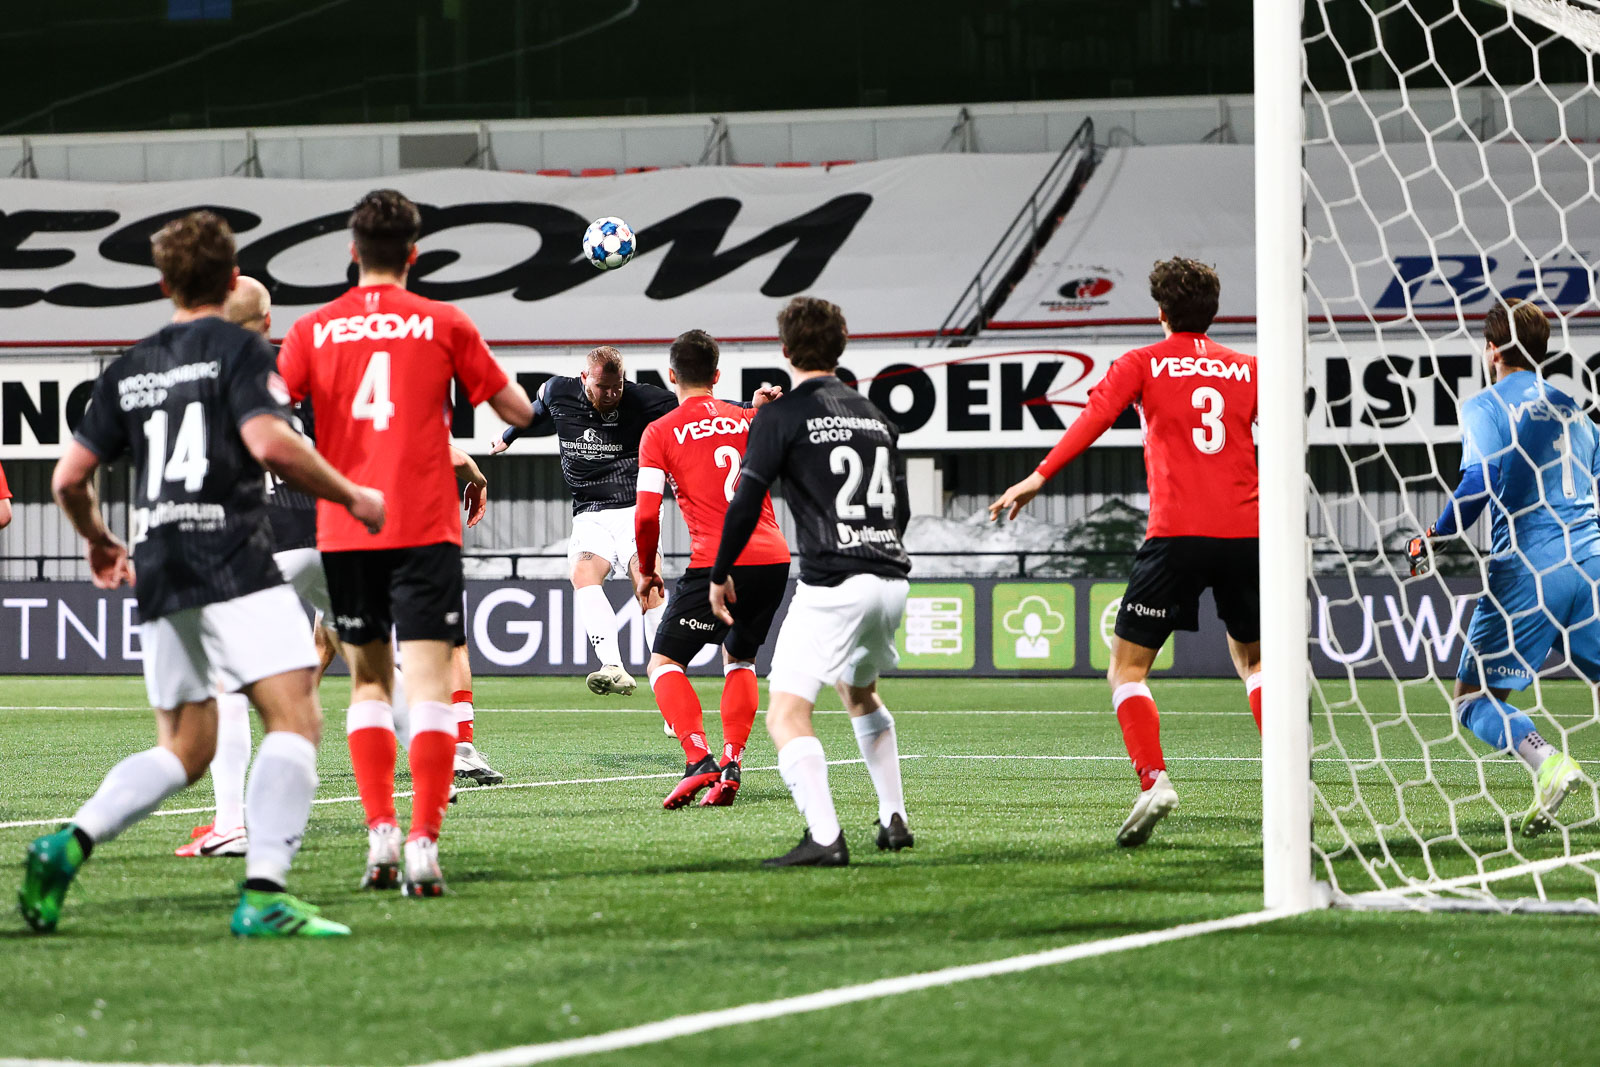 Kater Almere City FC op Vastenavond